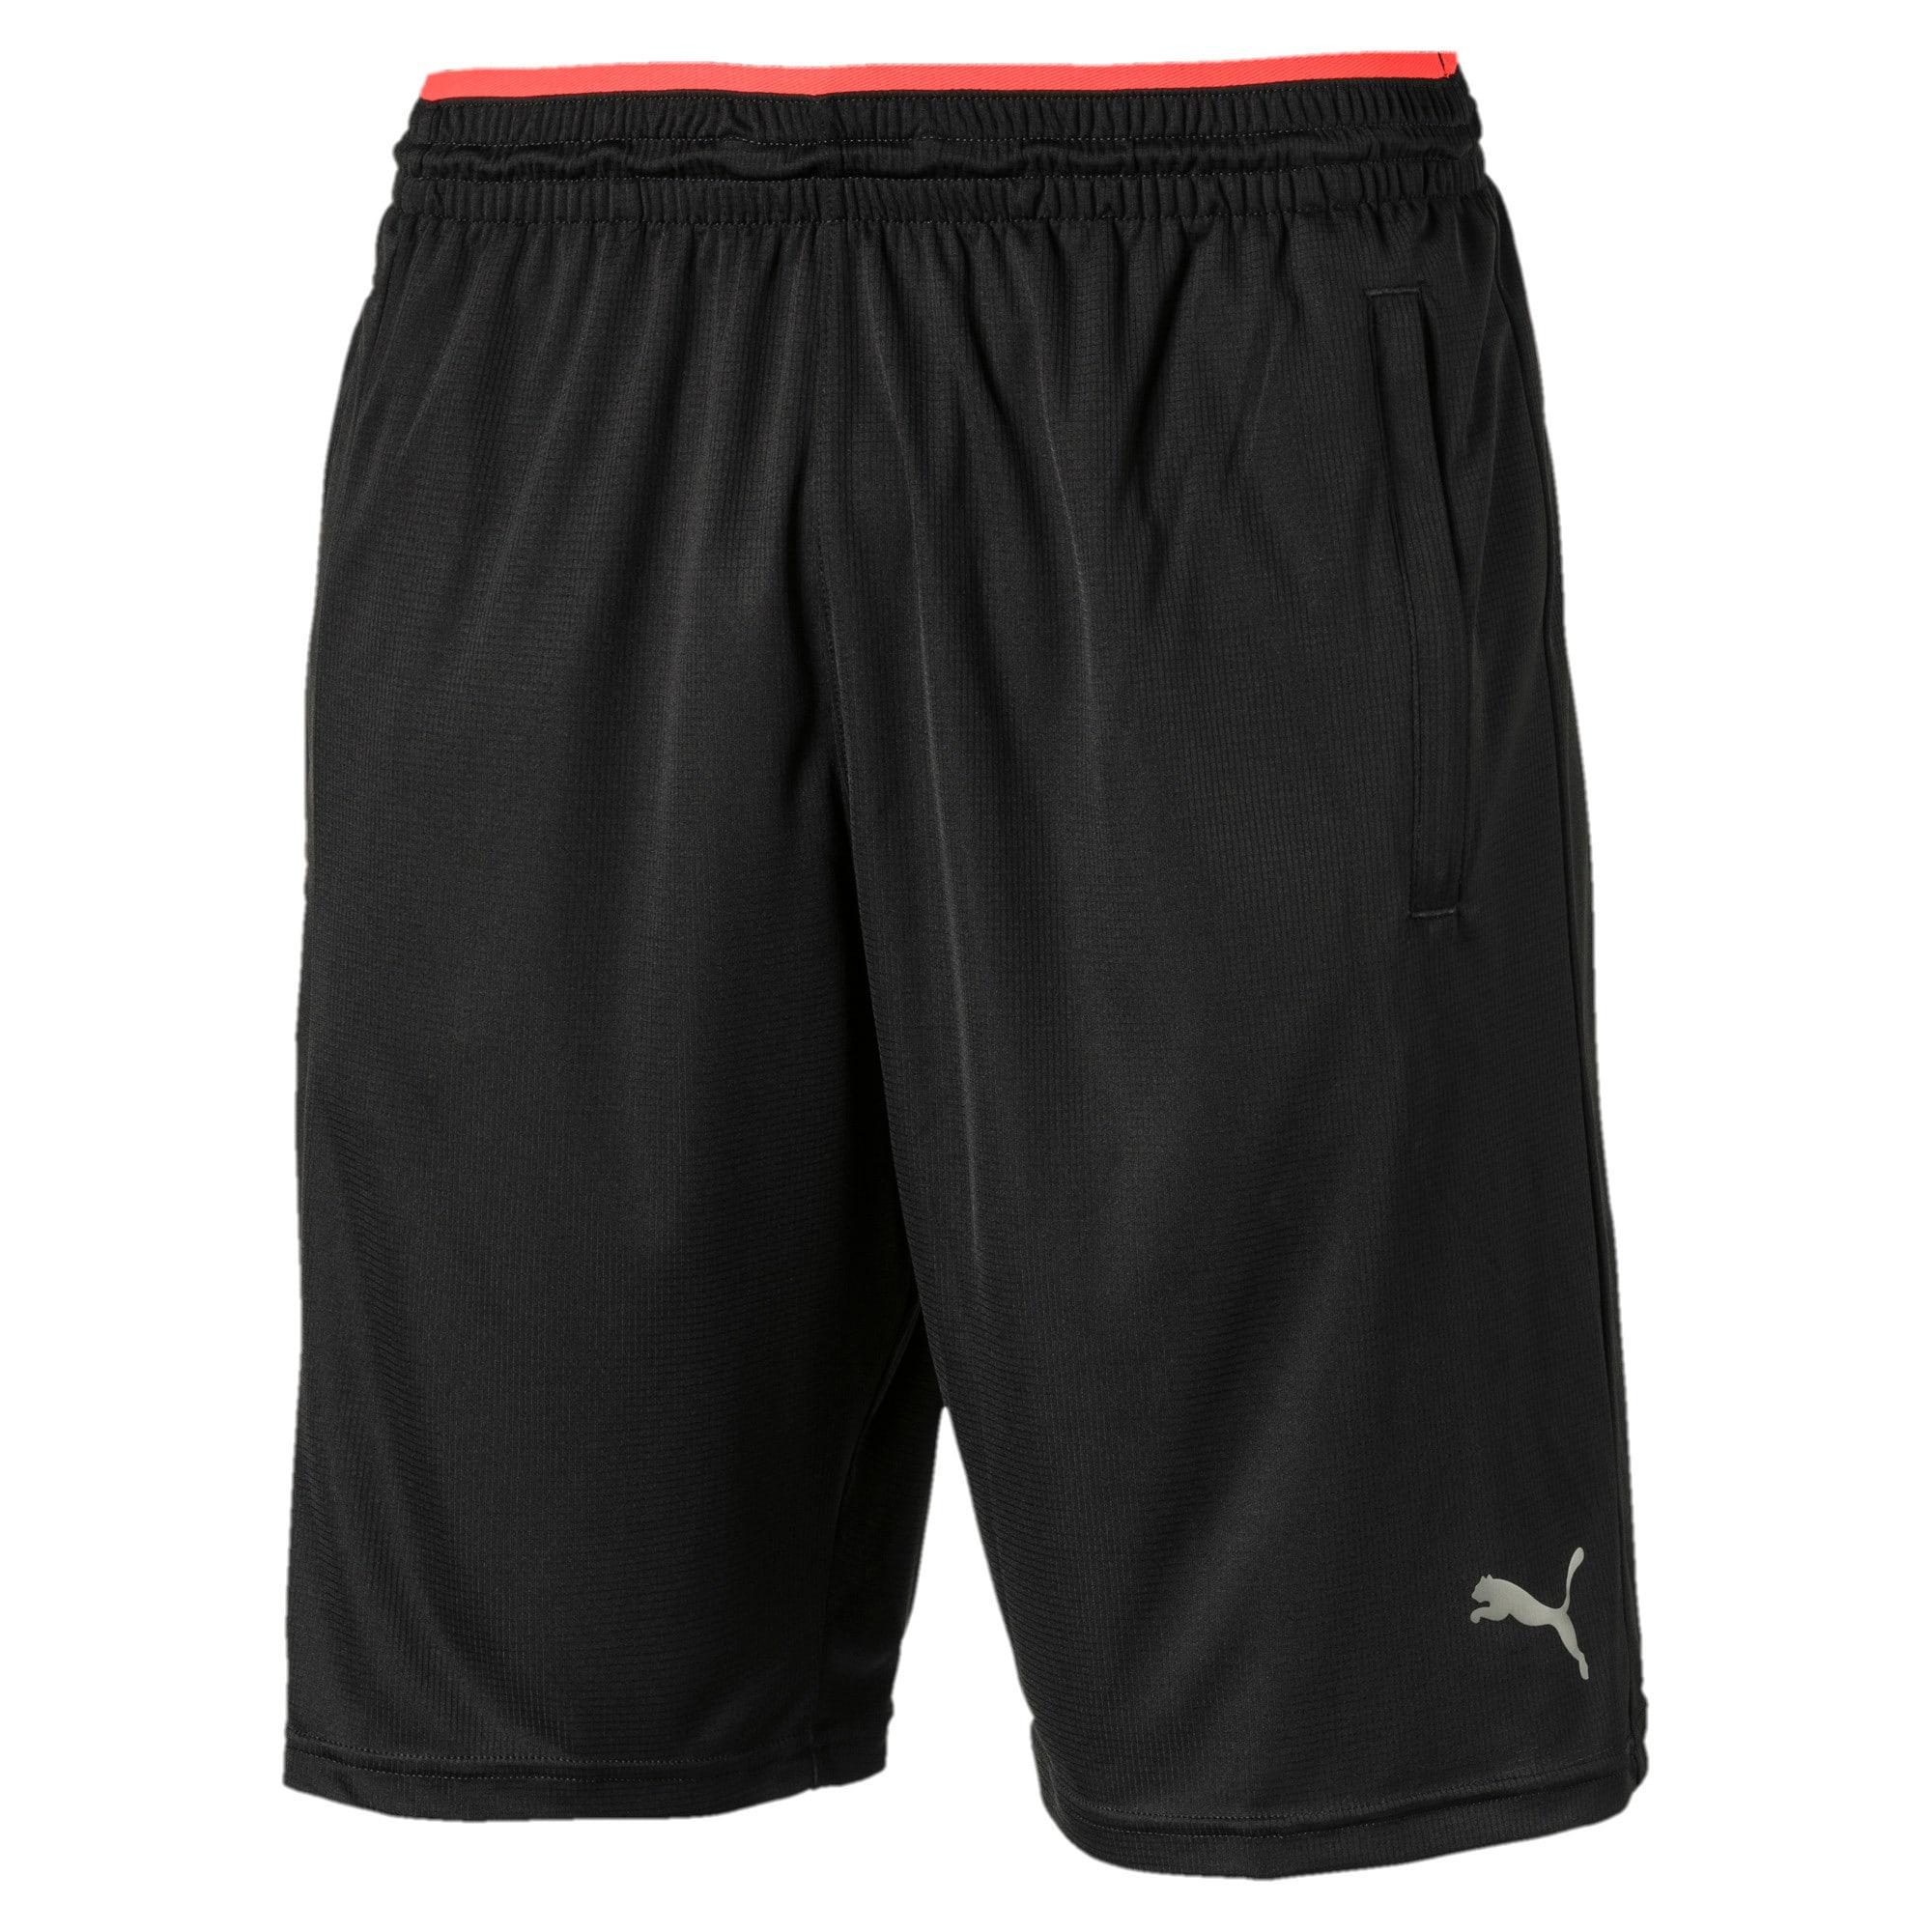 Miniatura 4 de Shorts de punto Collective para hombre, Puma Black-Nrgy Red, mediano